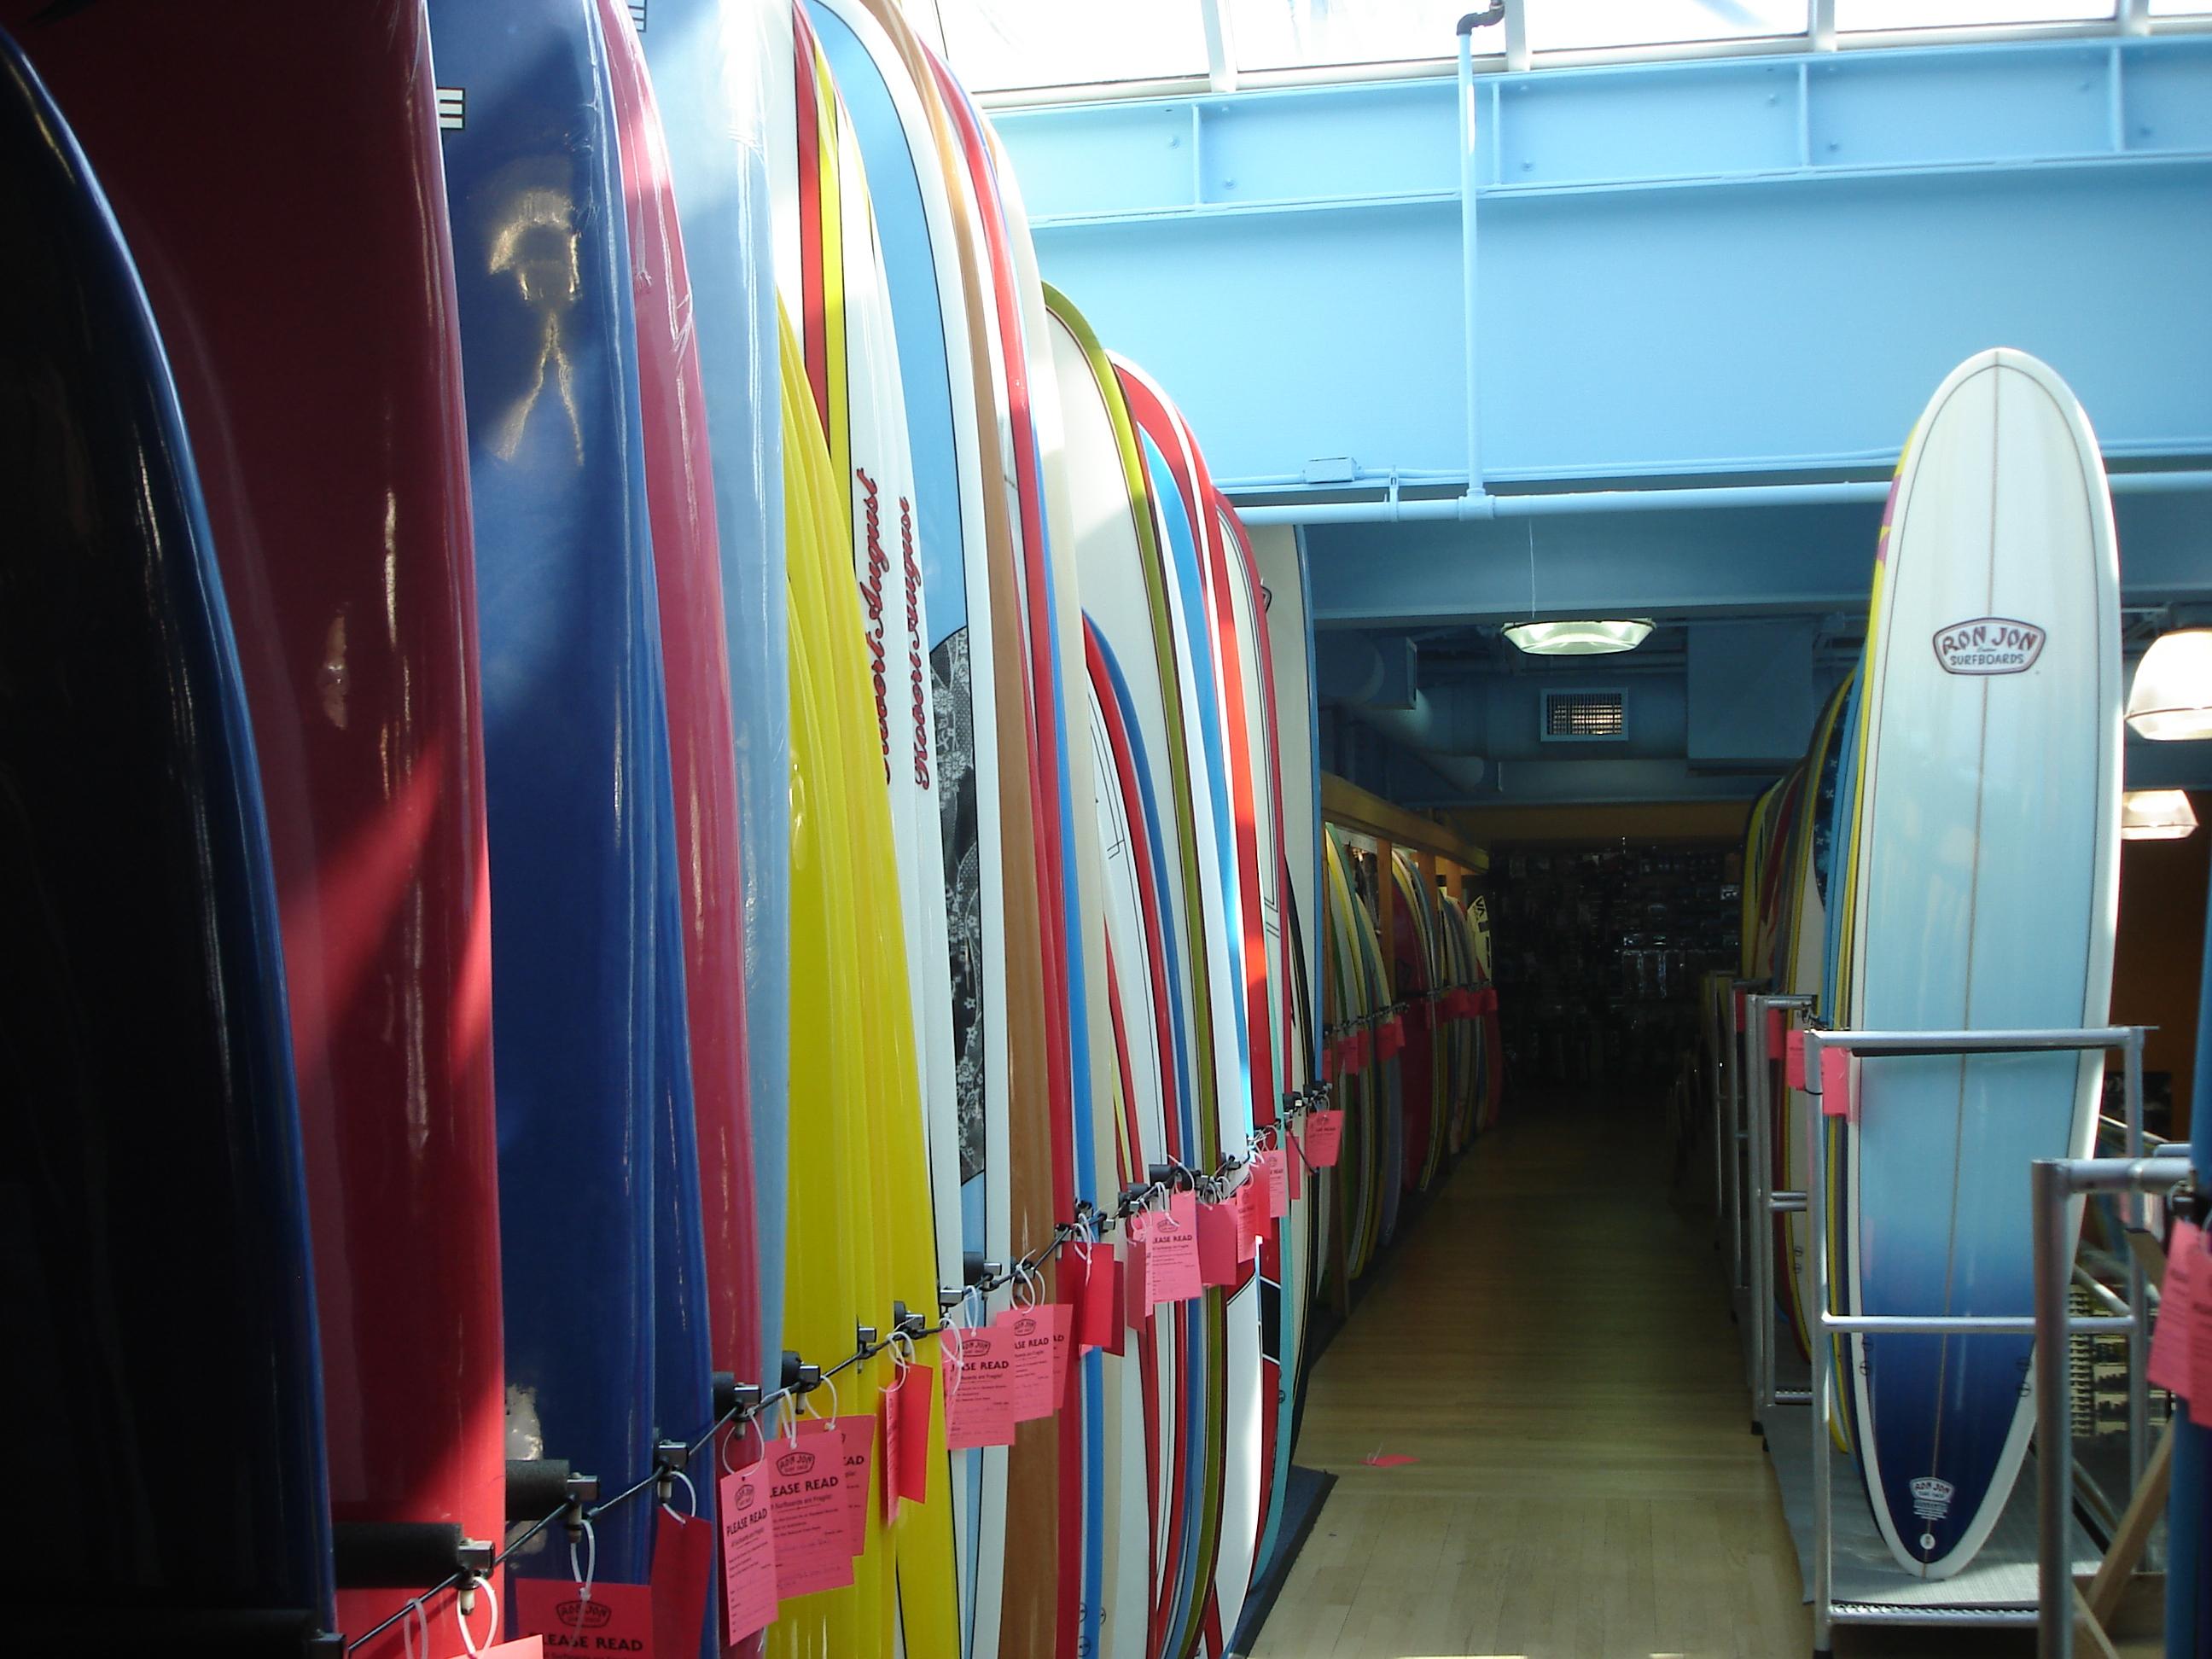 Ron Jon Surf Shop - Beach Haven, NJ